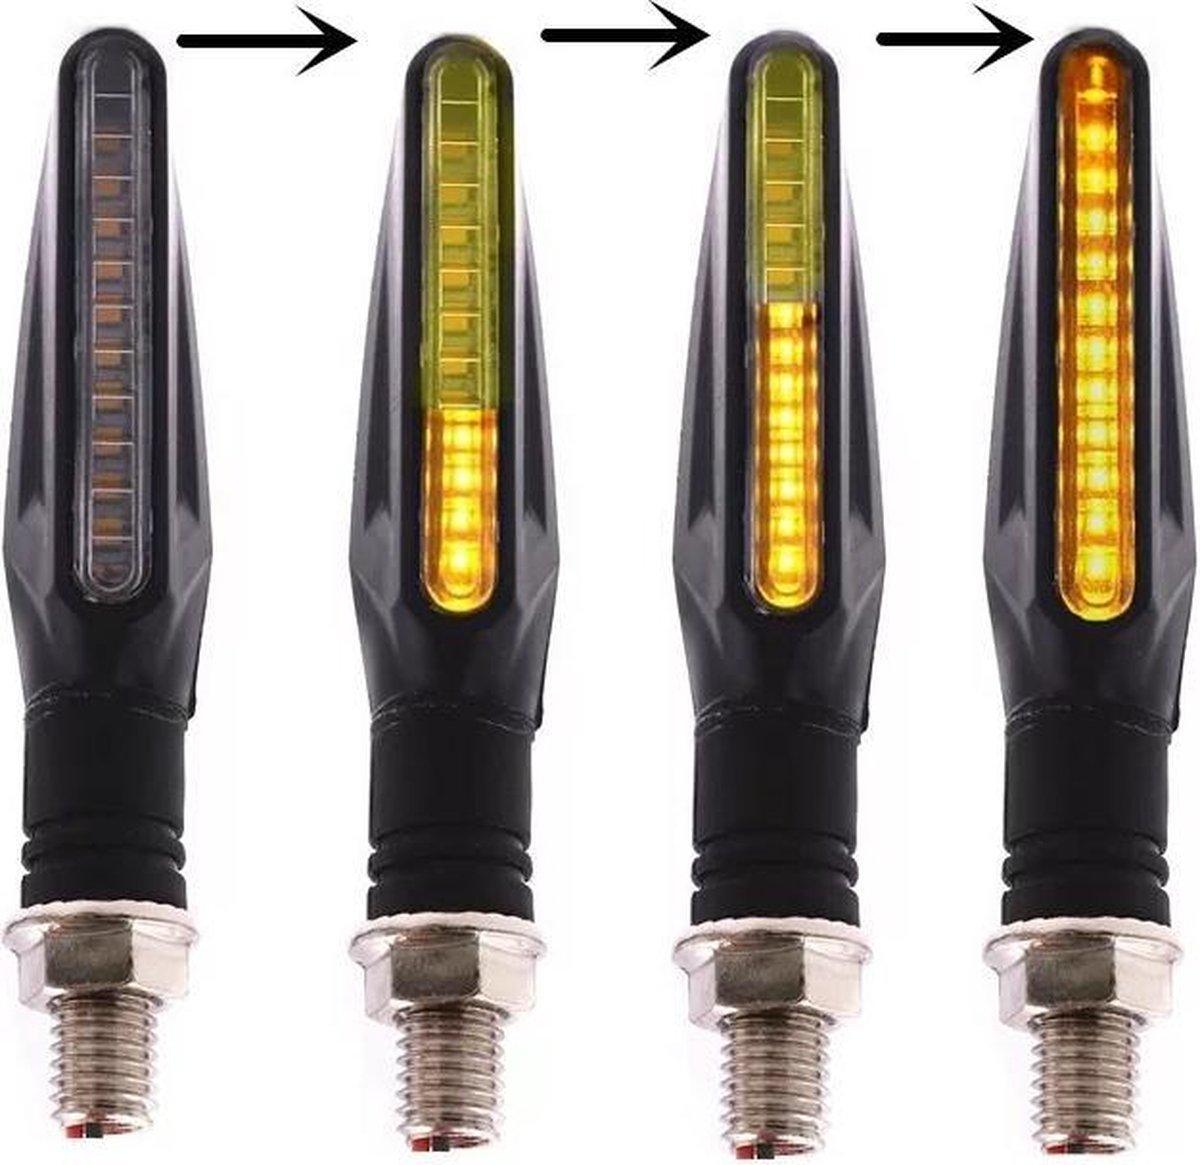 BikeMotion Dynamische LED Knipperlichten  - Motor/Scooter/Brommer - Audi/VW Style - Set van 2 stuks